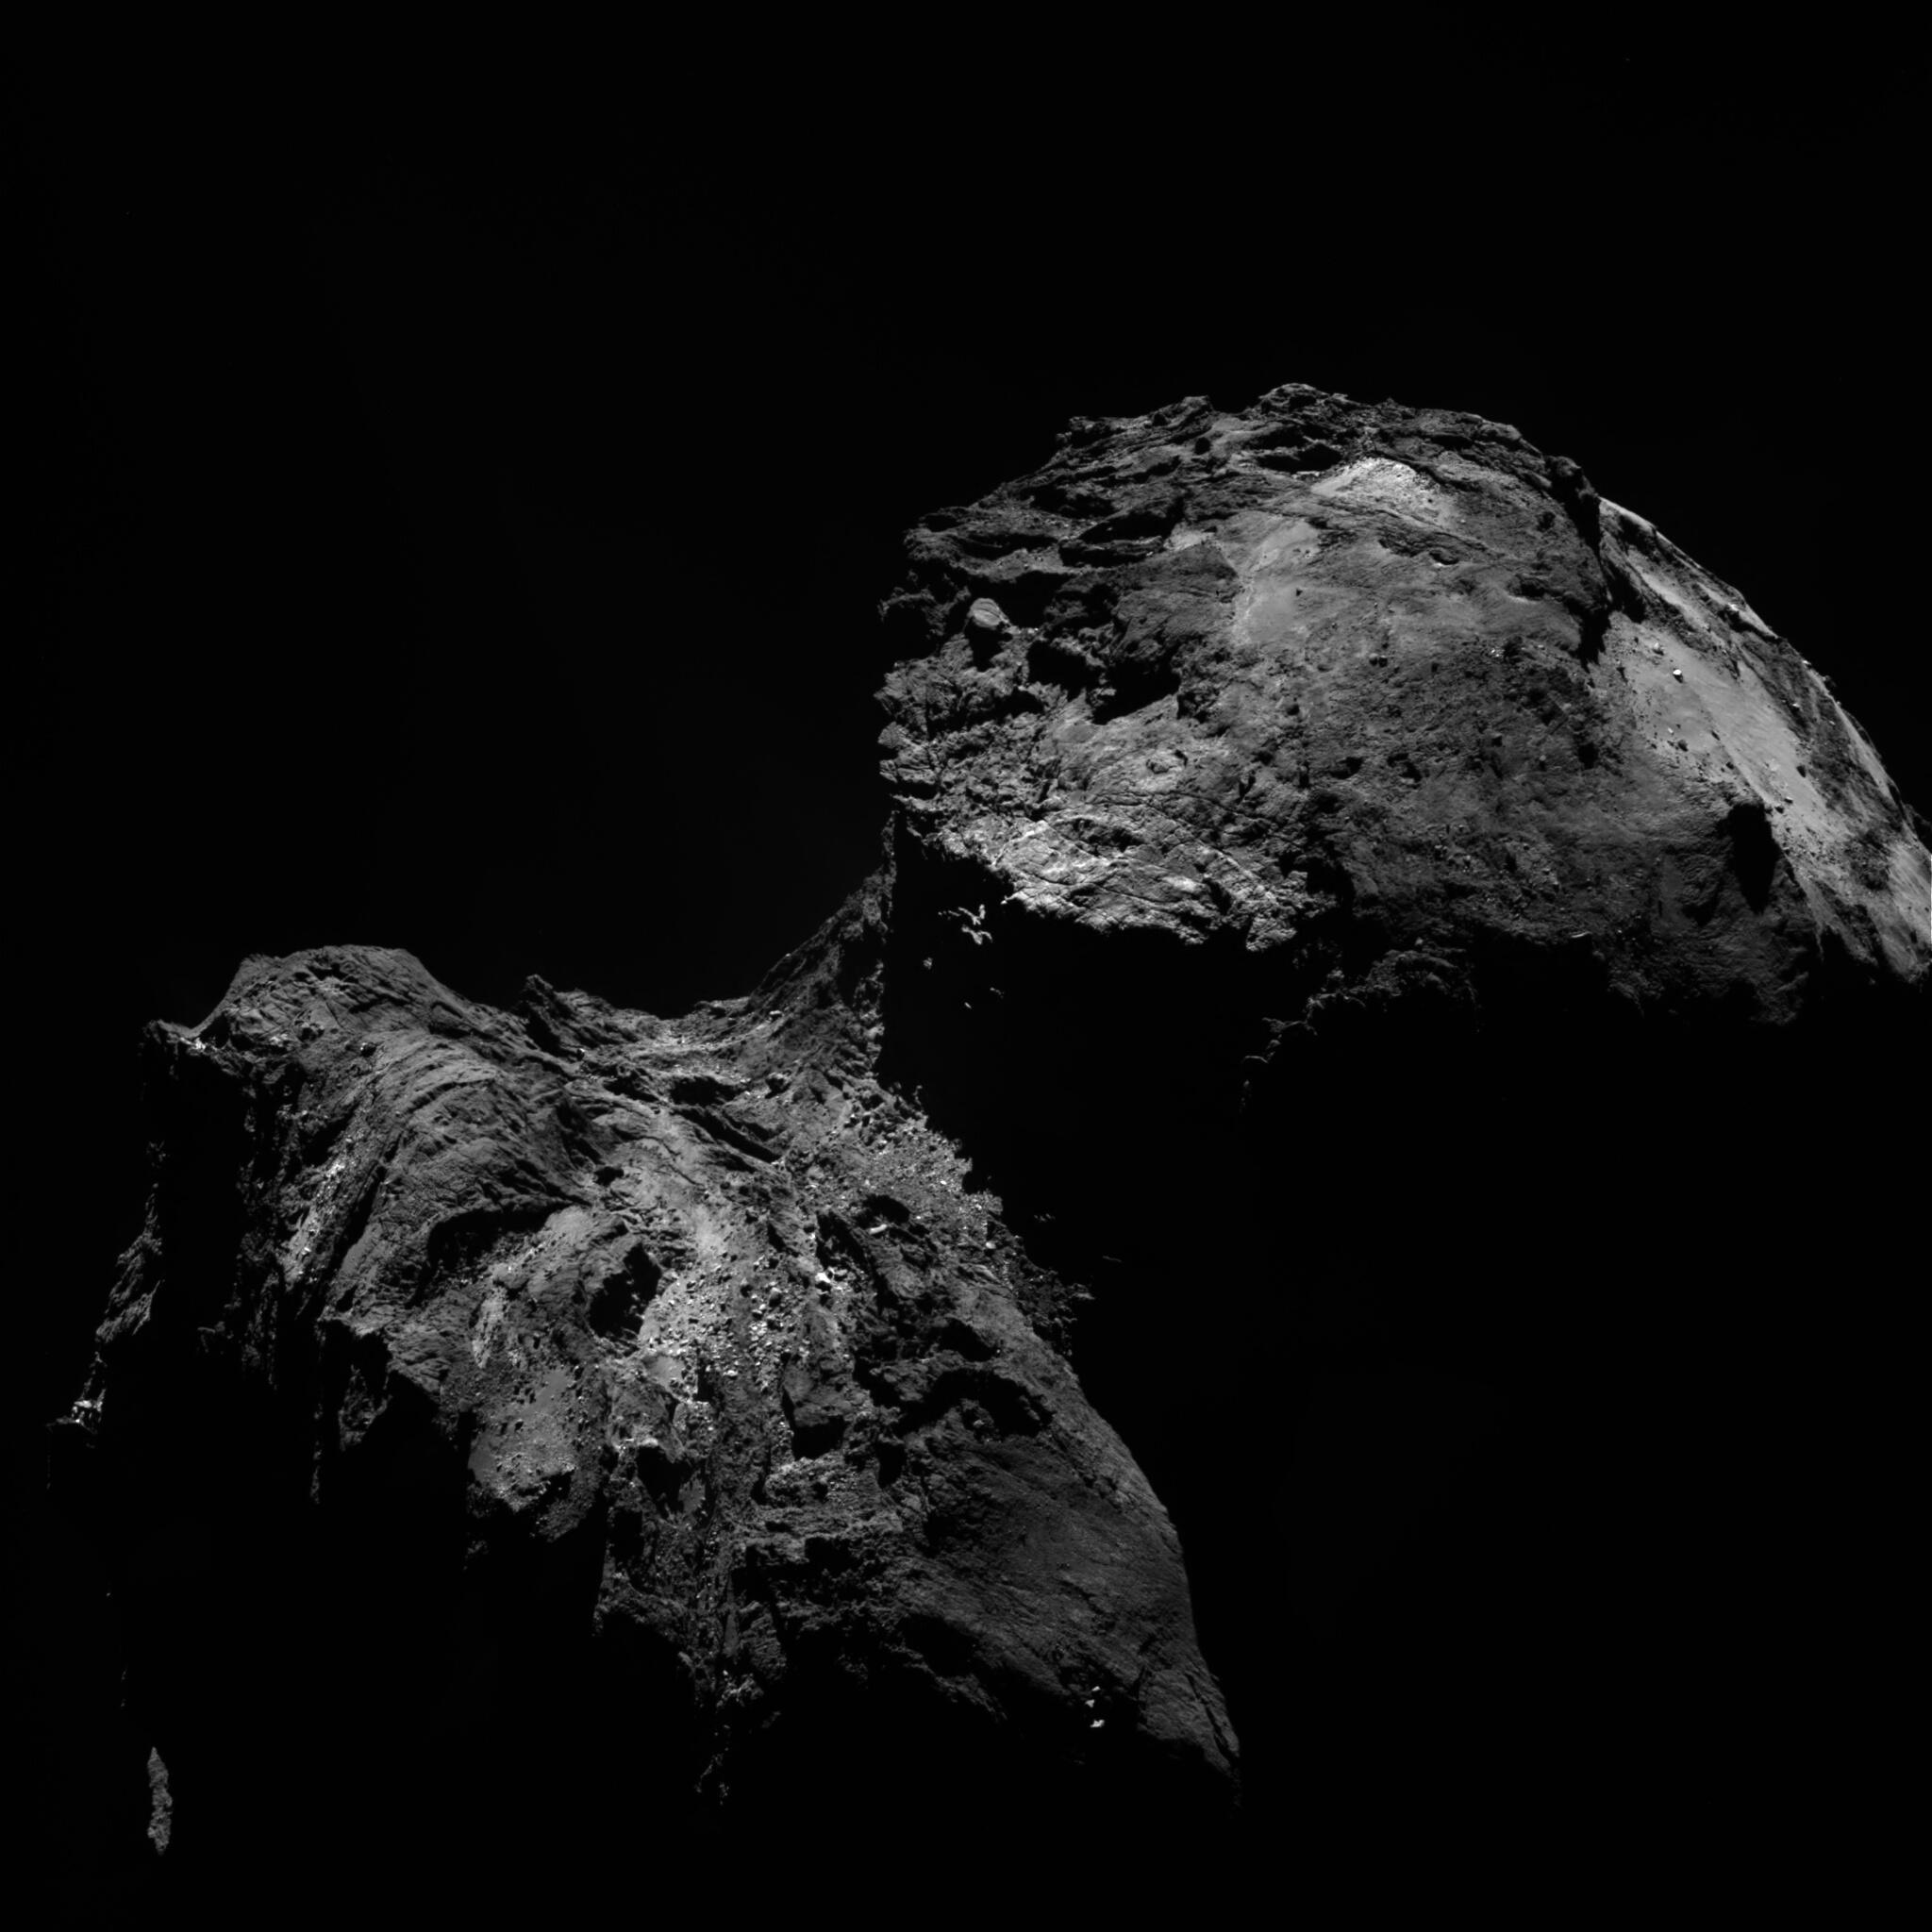 Bild zu Rosetta, Komet